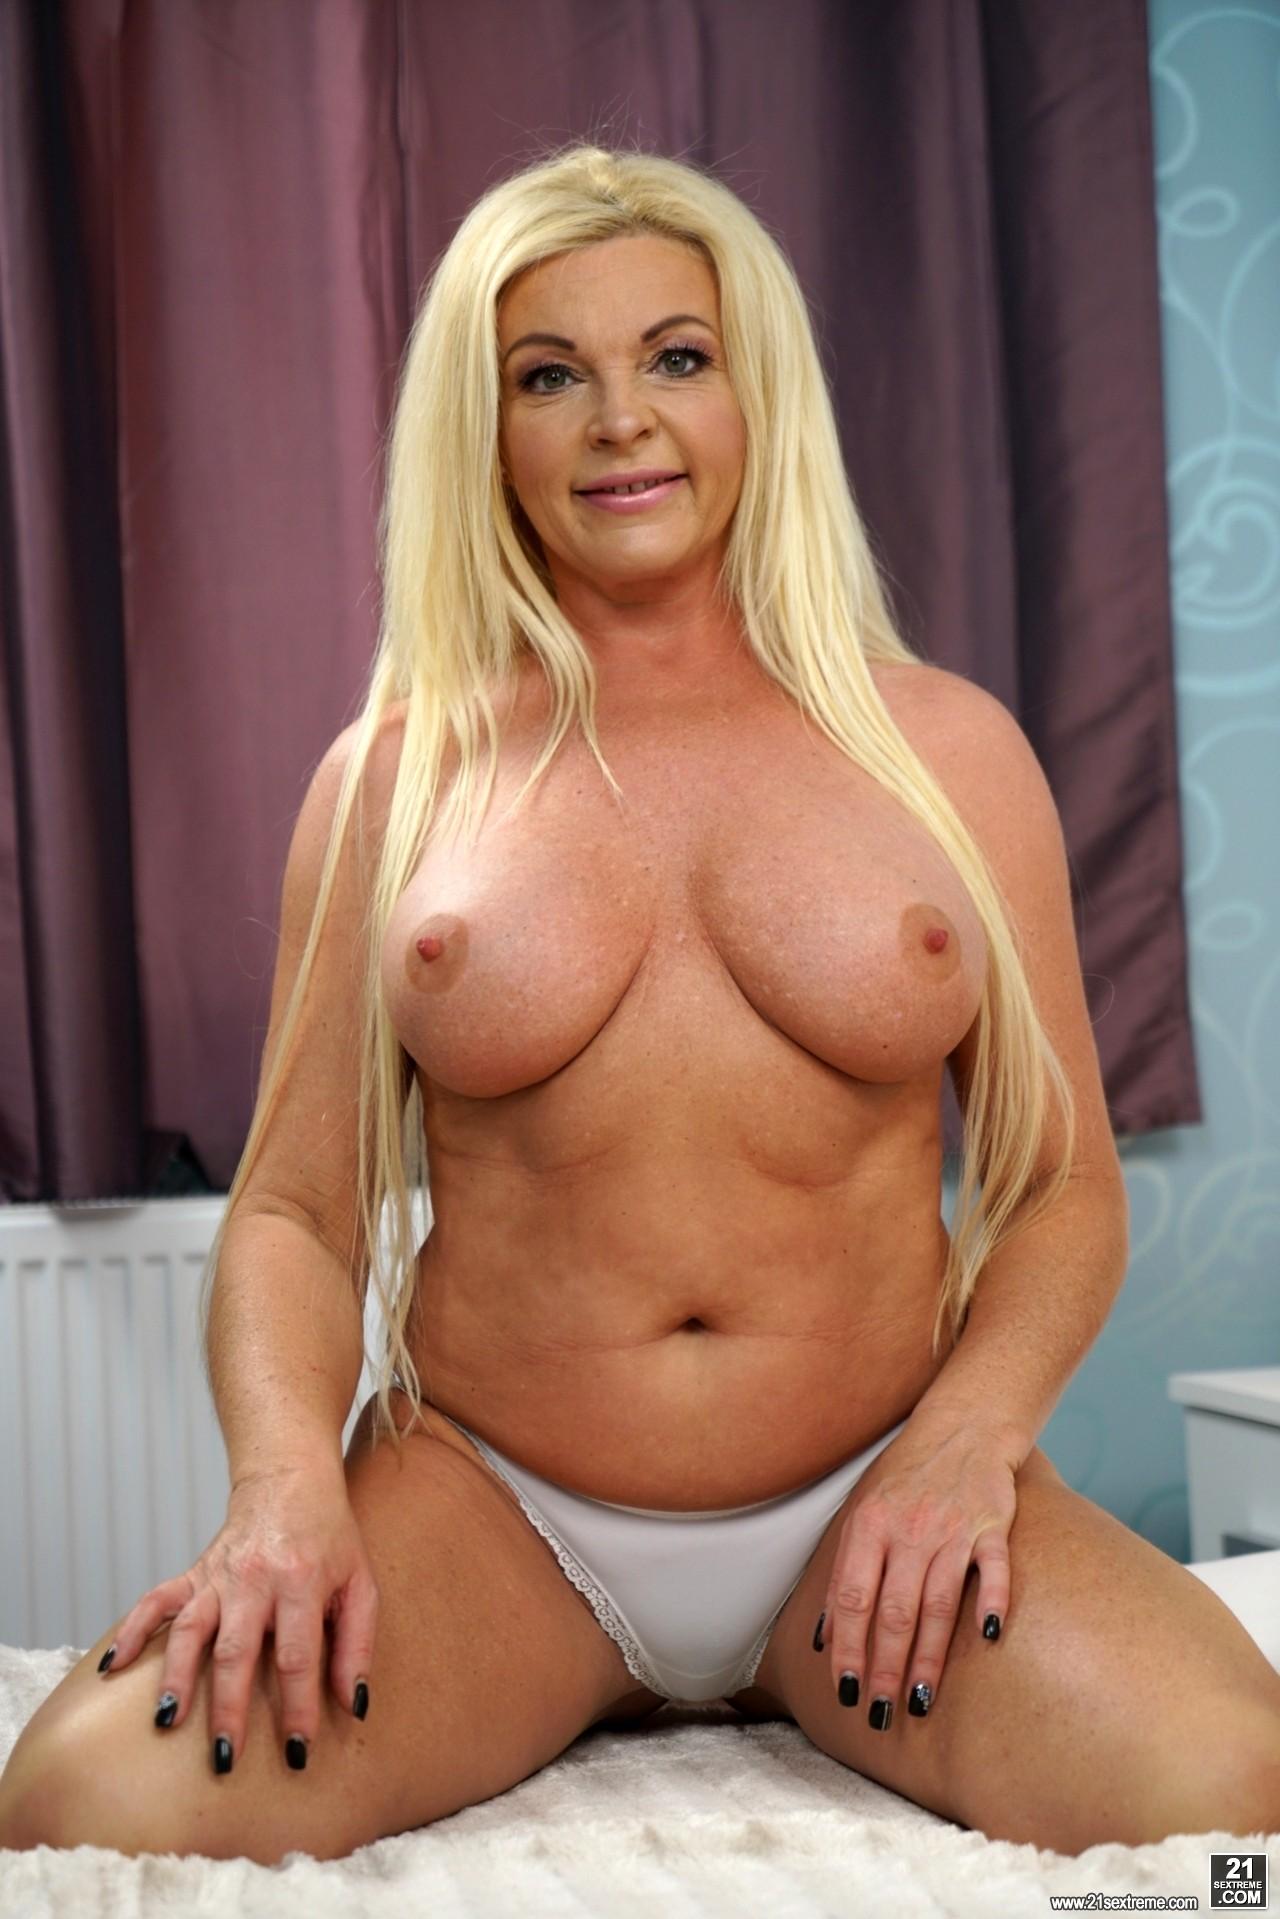 Babe Today 21 Sextury Franny Fandom Granny Porn Mobi Porn Pics-3627